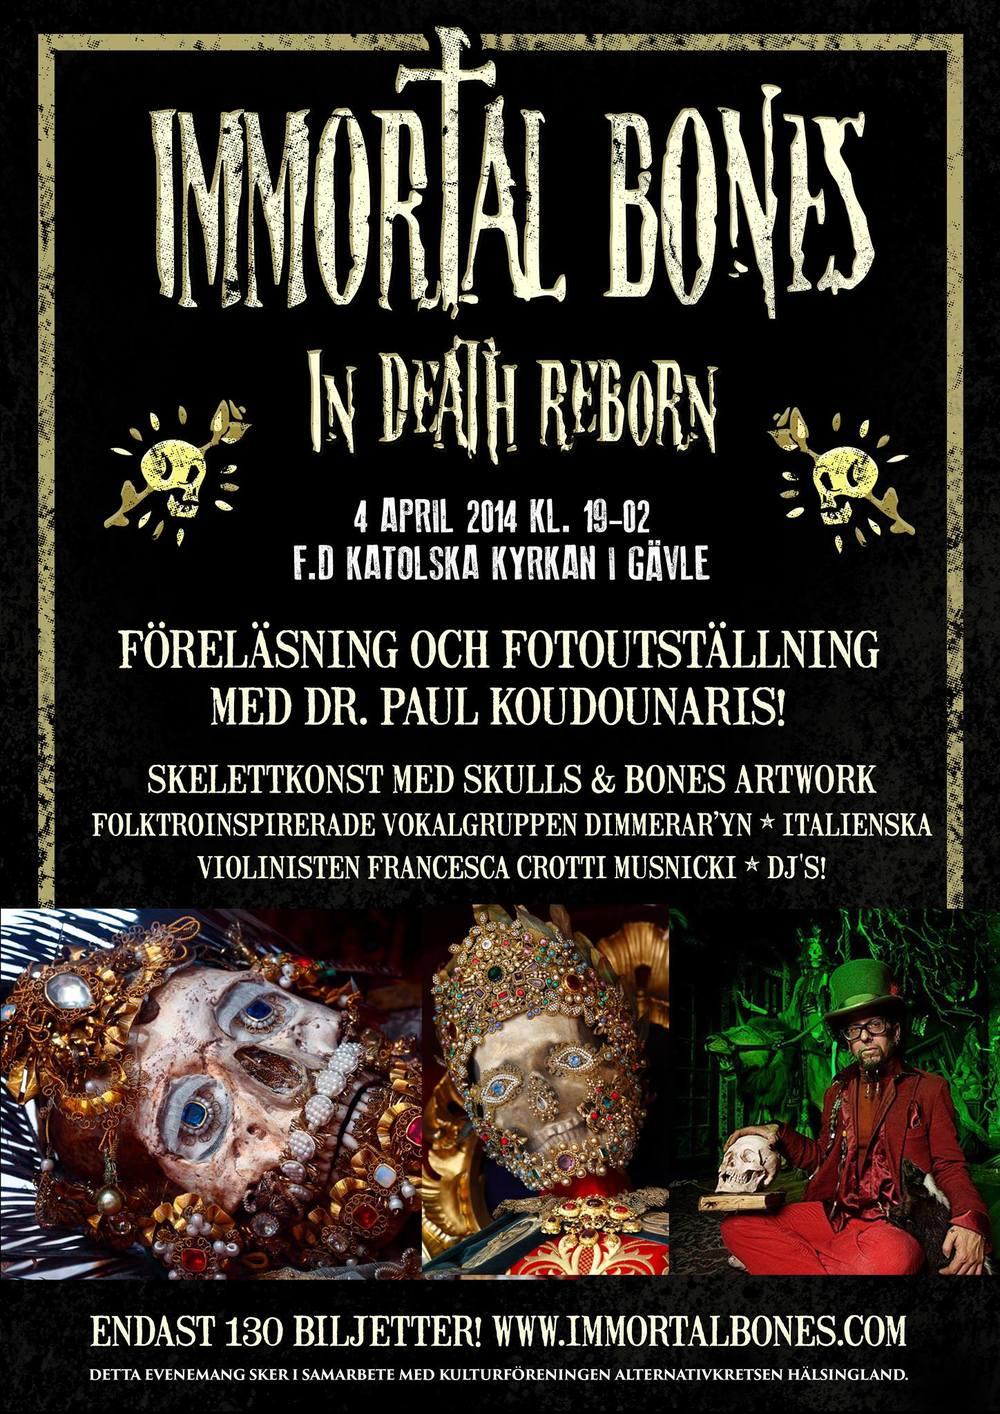 www.immortalbones.com